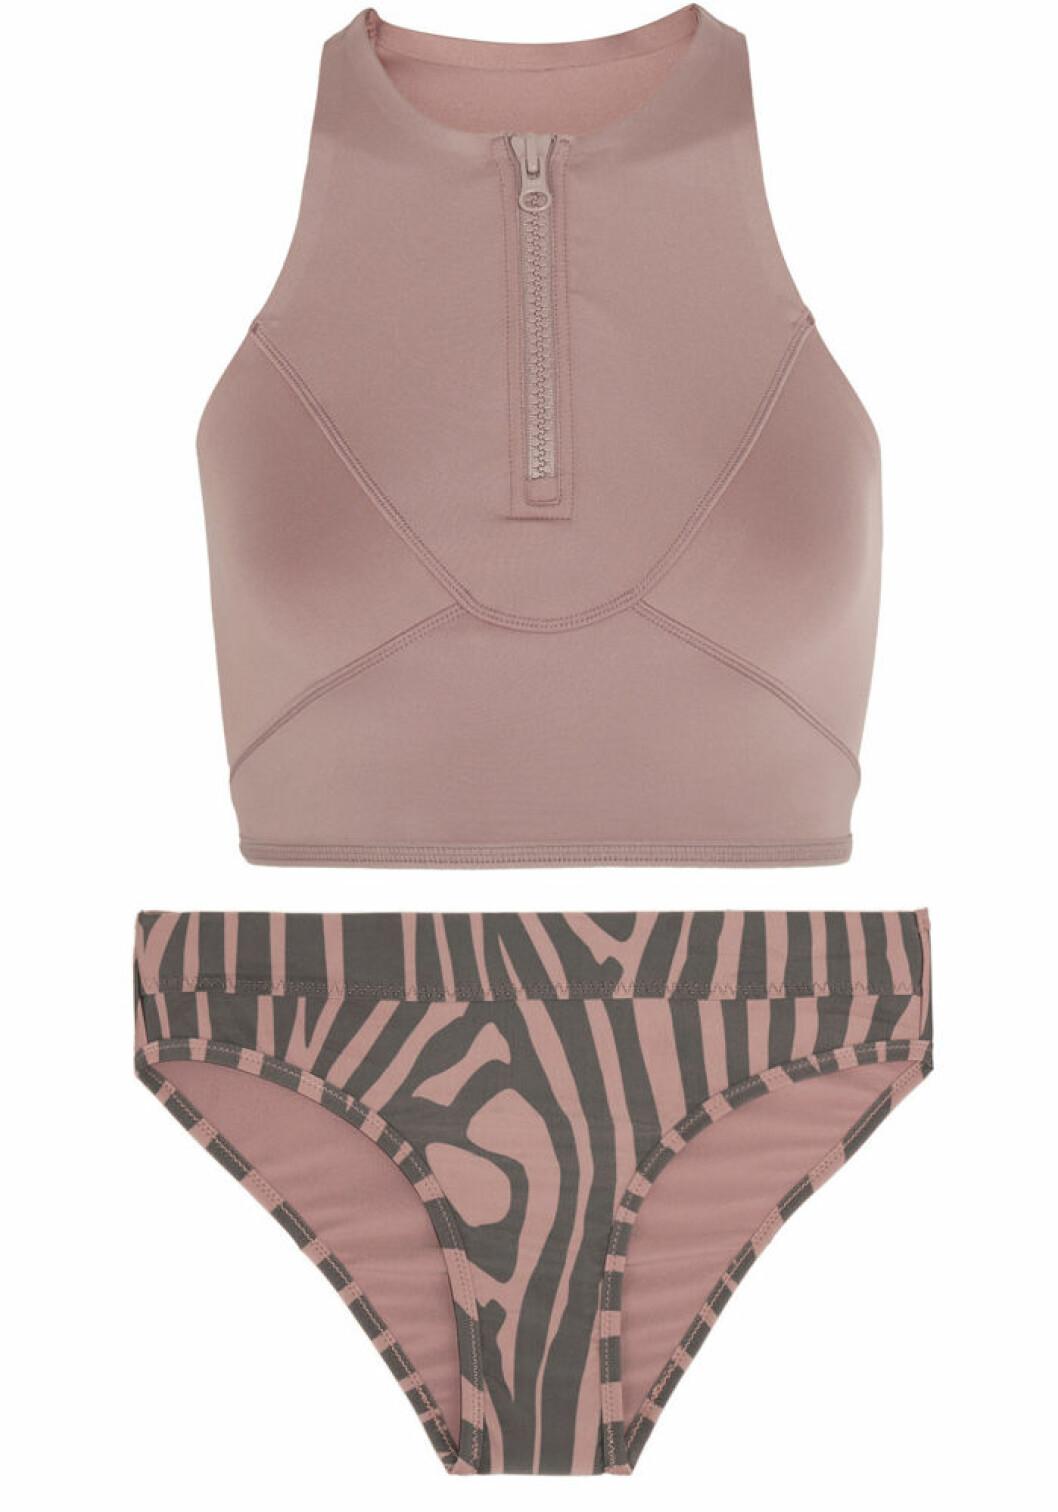 stella mccartney adidas bikini